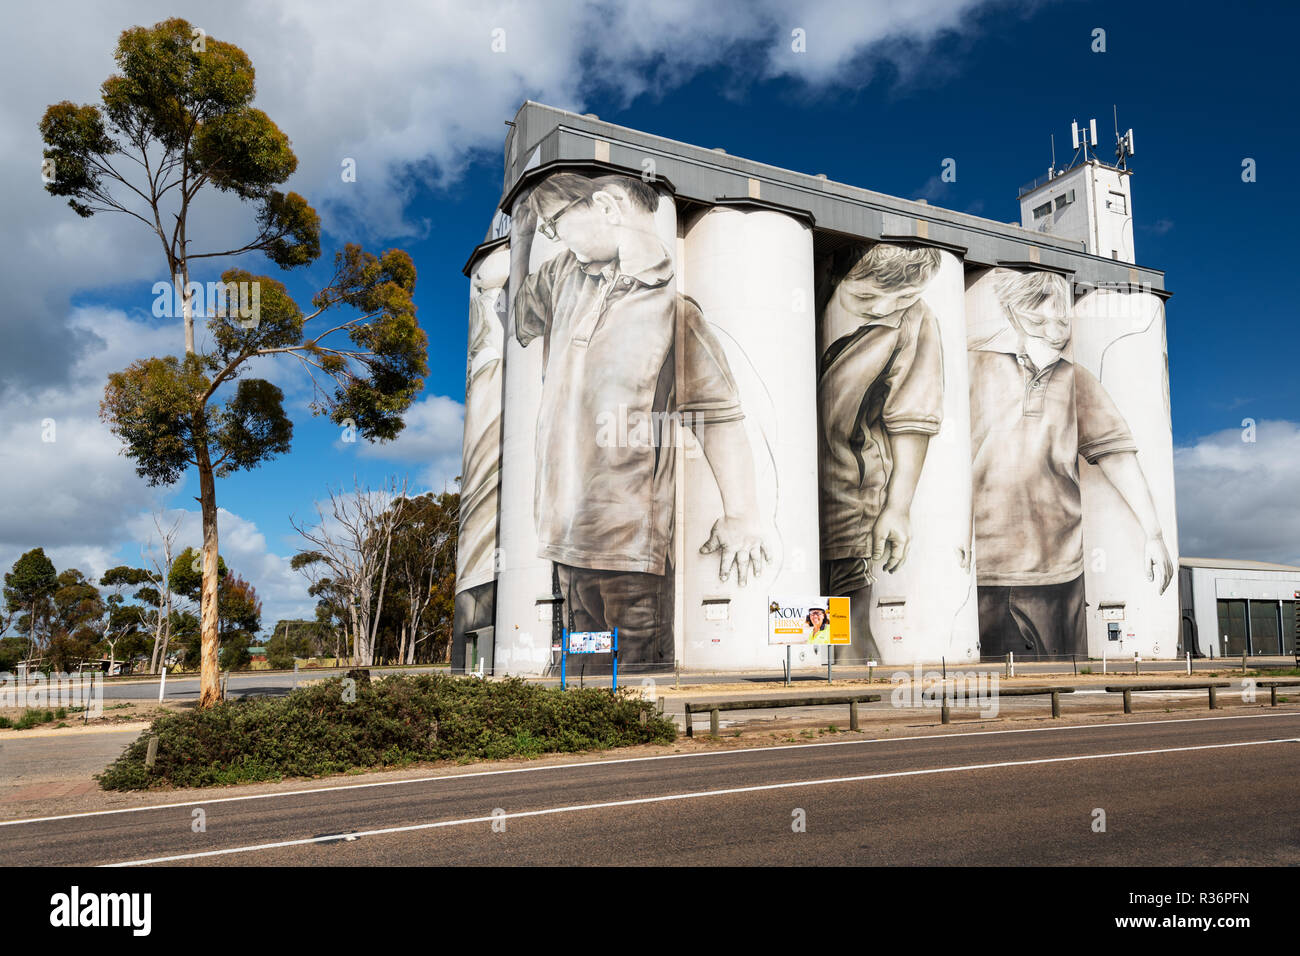 Berühmte silo Wandbild im Süden Australiens Coonalpyn. Stockbild